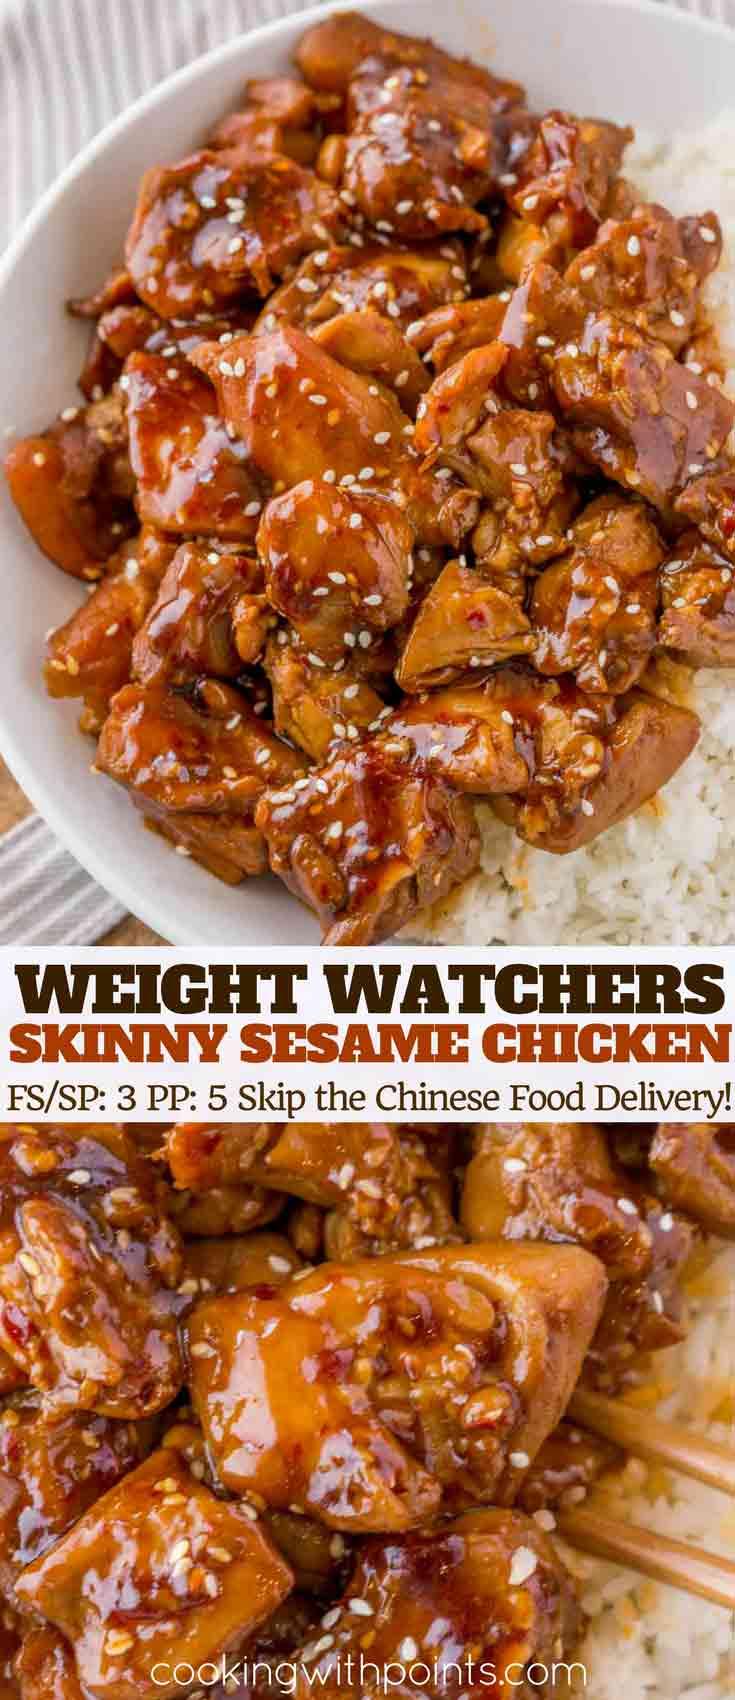 Skinny Sesame Chicken Collage